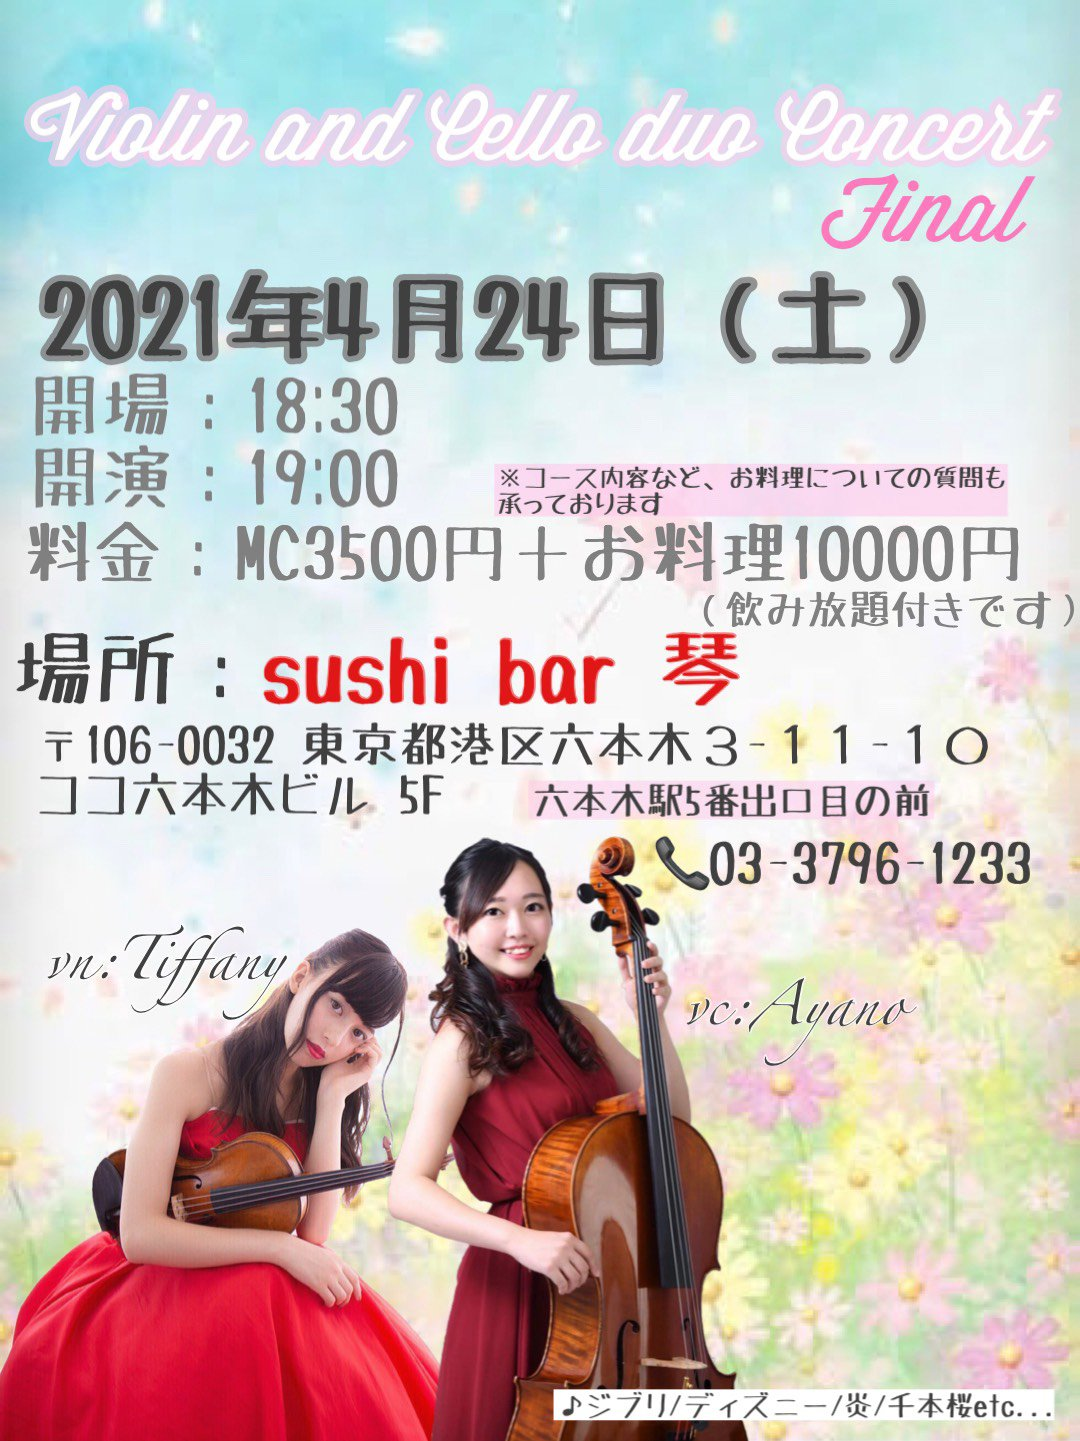 Violin&Cello Duo Concert(東京)のイメージその1